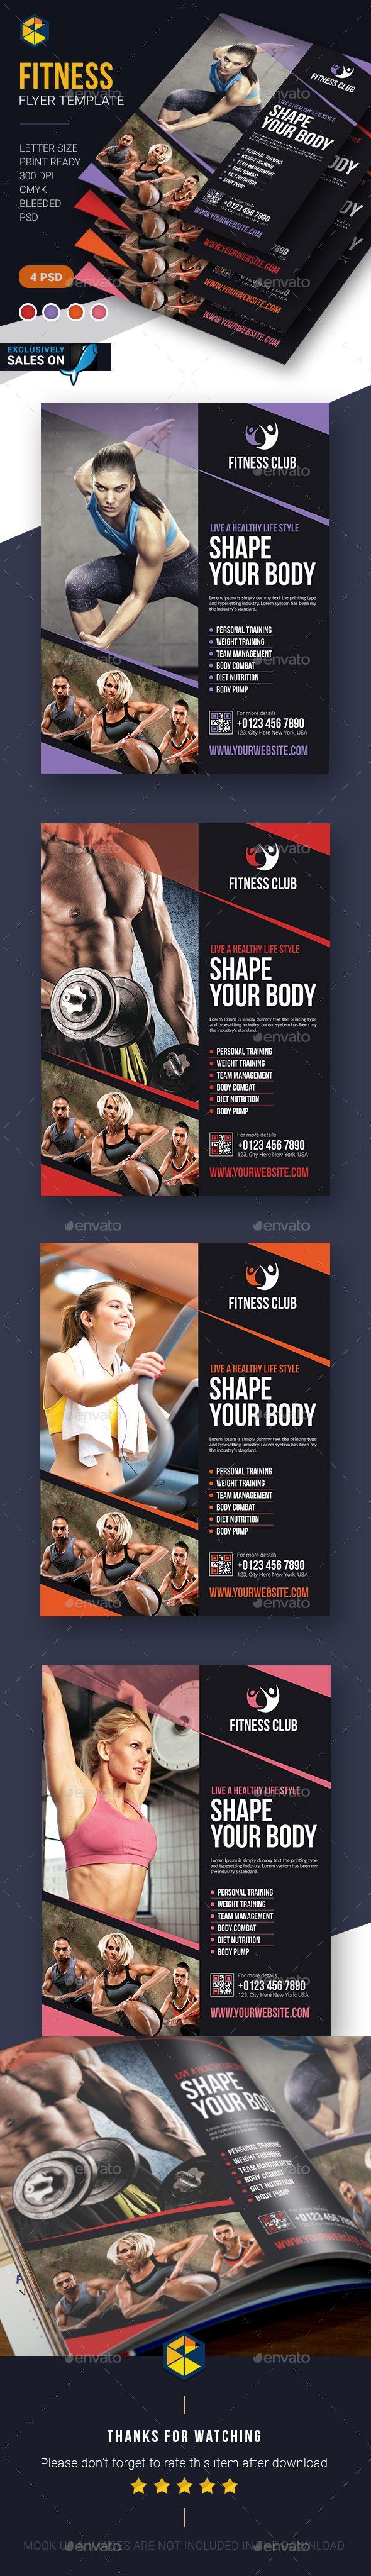 Fitness Flyer Template PSD #design Download: http://graphicriver.net/item/fitness-flyer-template/14327248?ref=ksioks